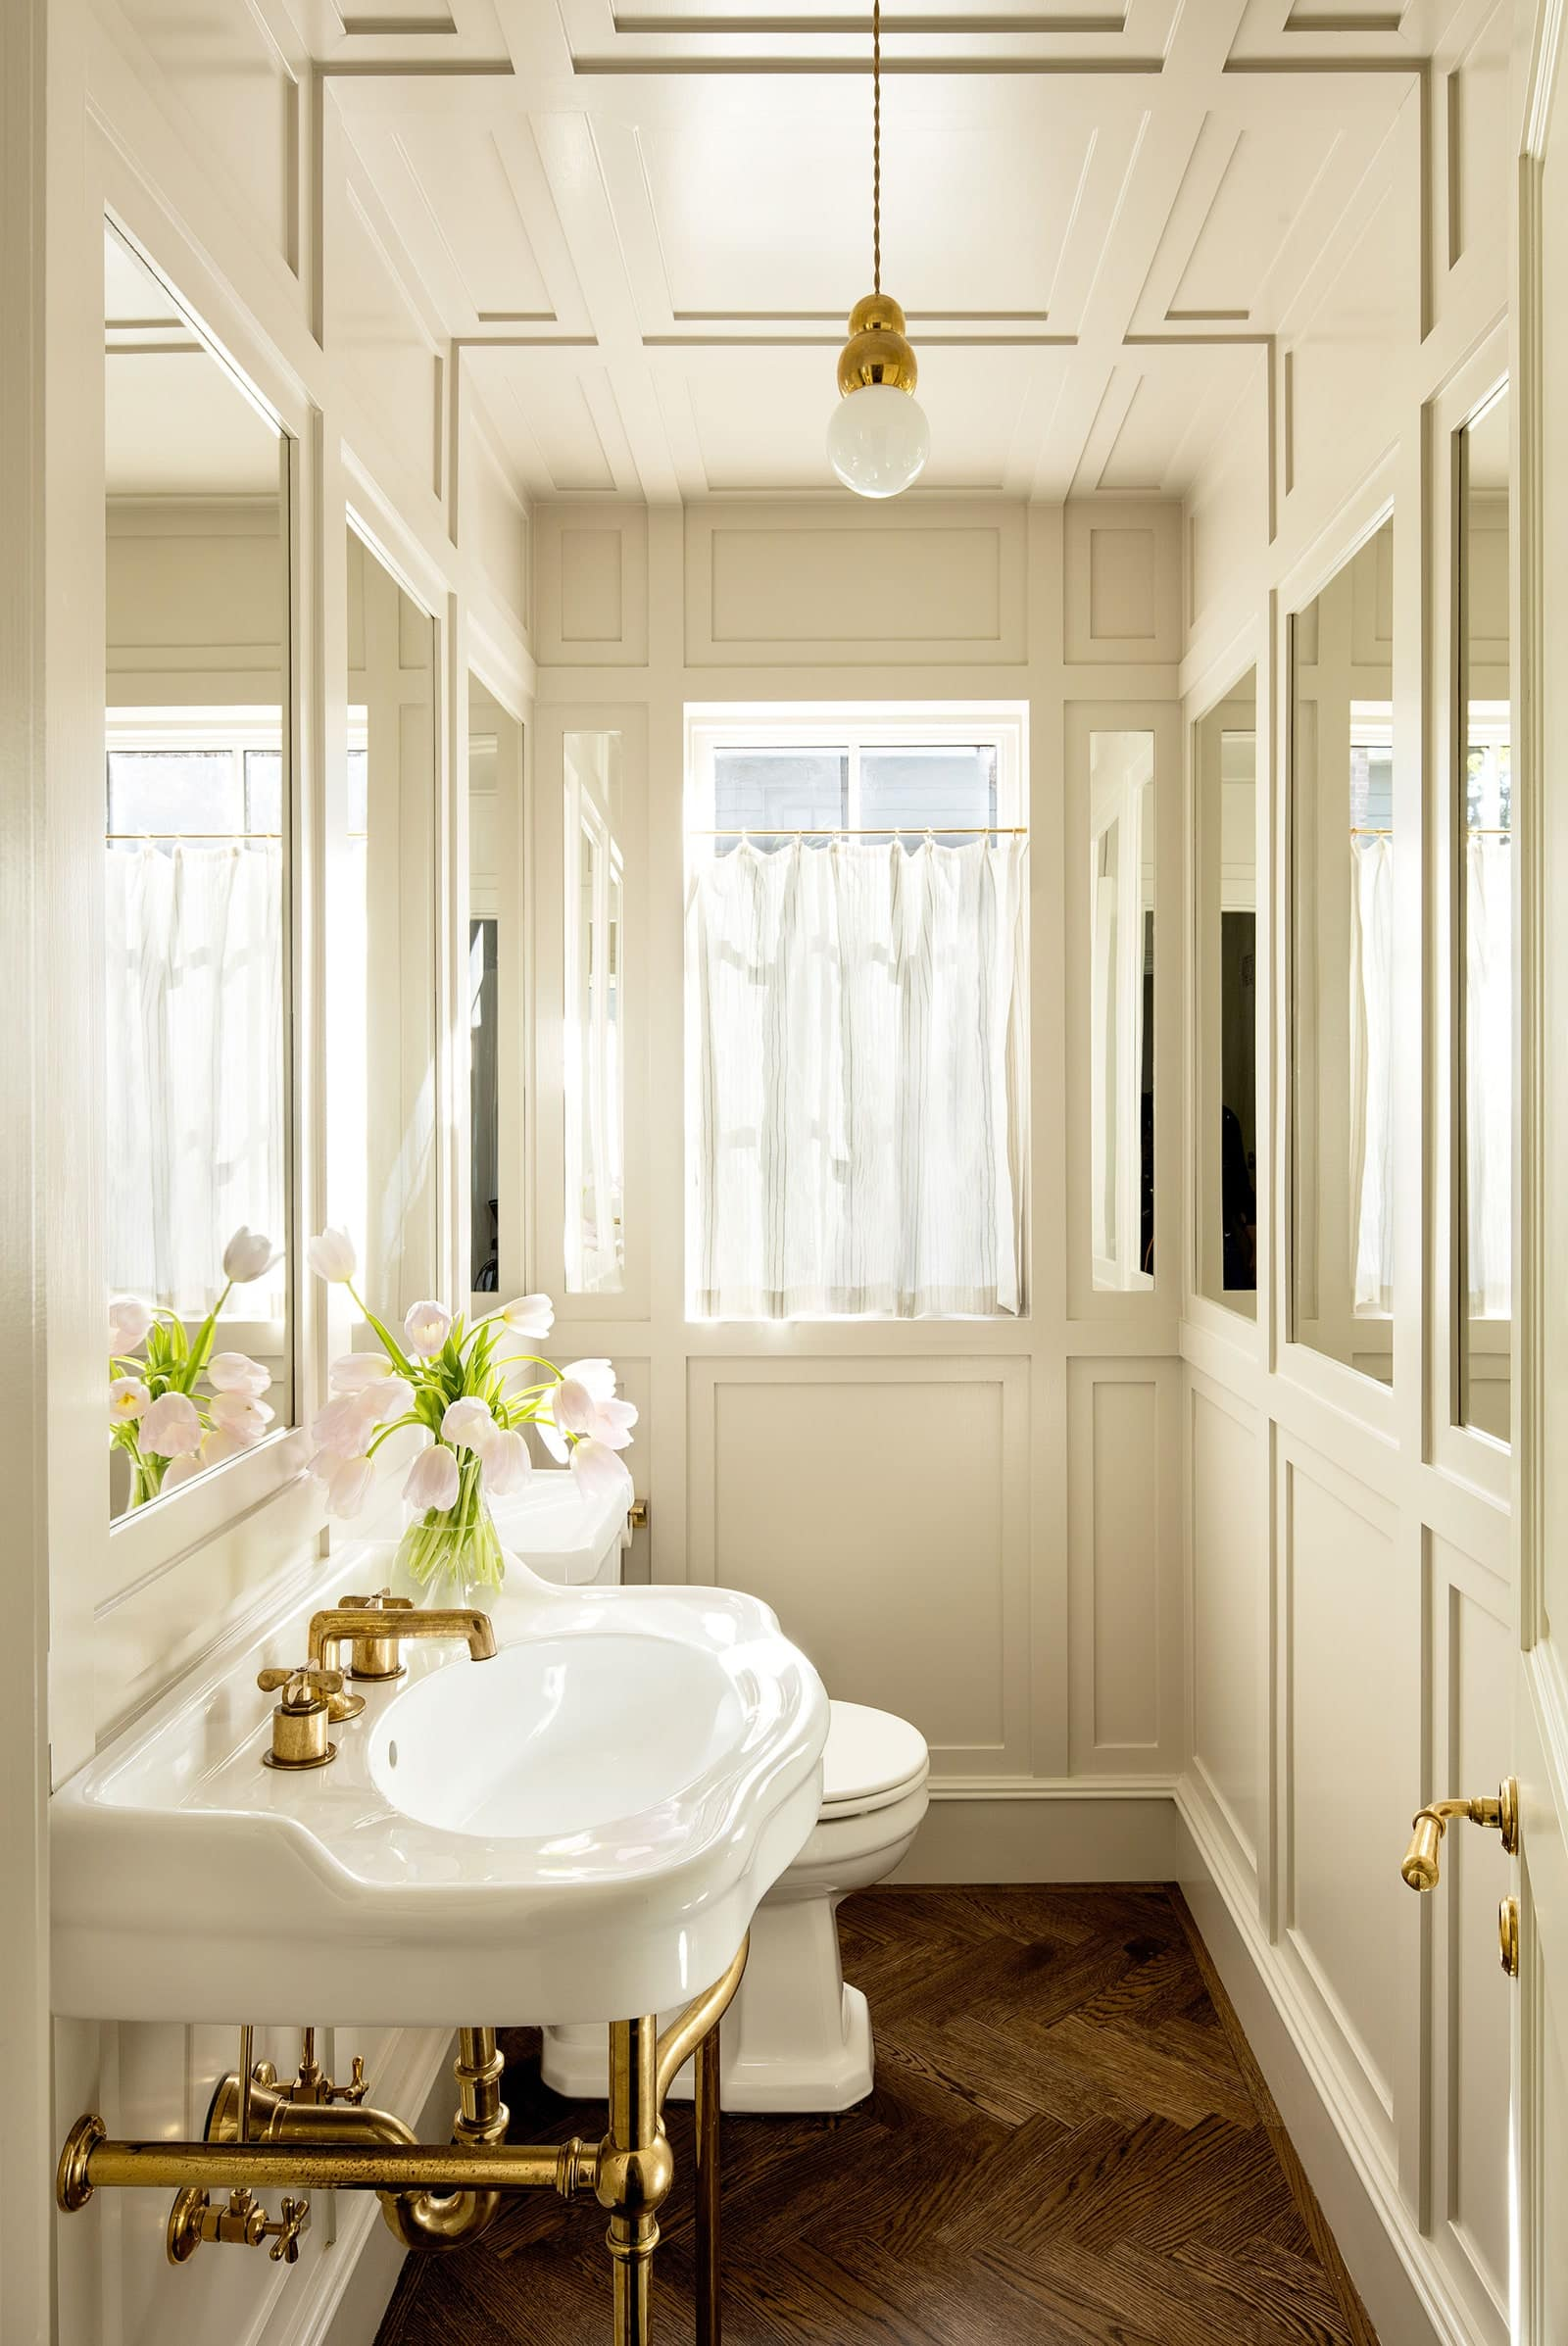 jessica-helgerson-bathroom-design